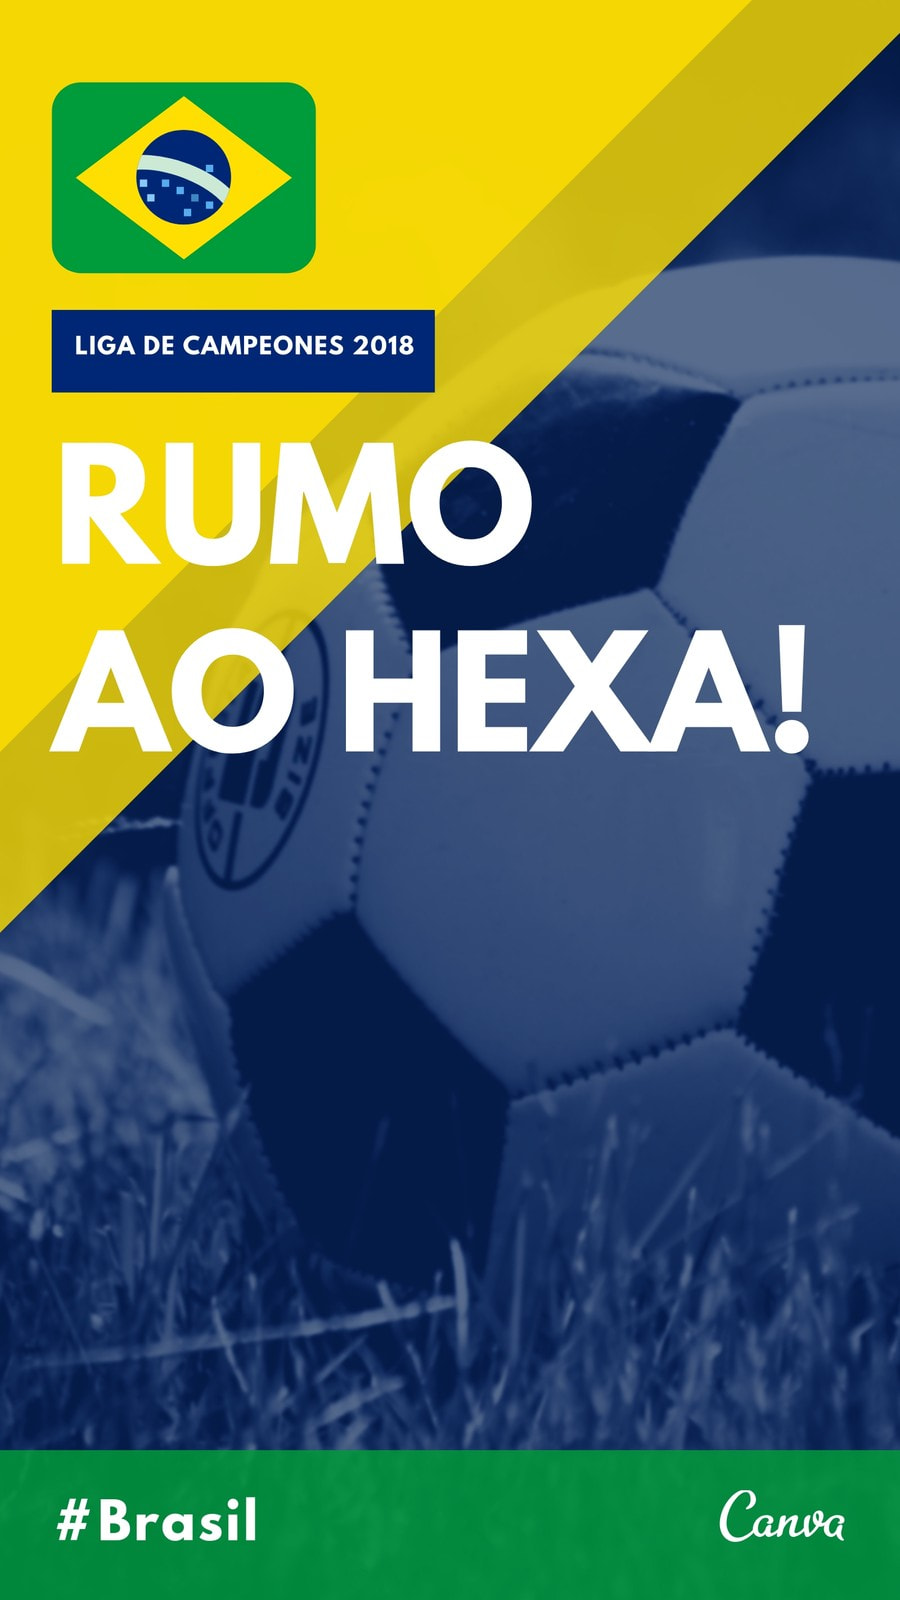 Amarillo Azul Verde Brasil Ánimo Fútbol Tu Historia